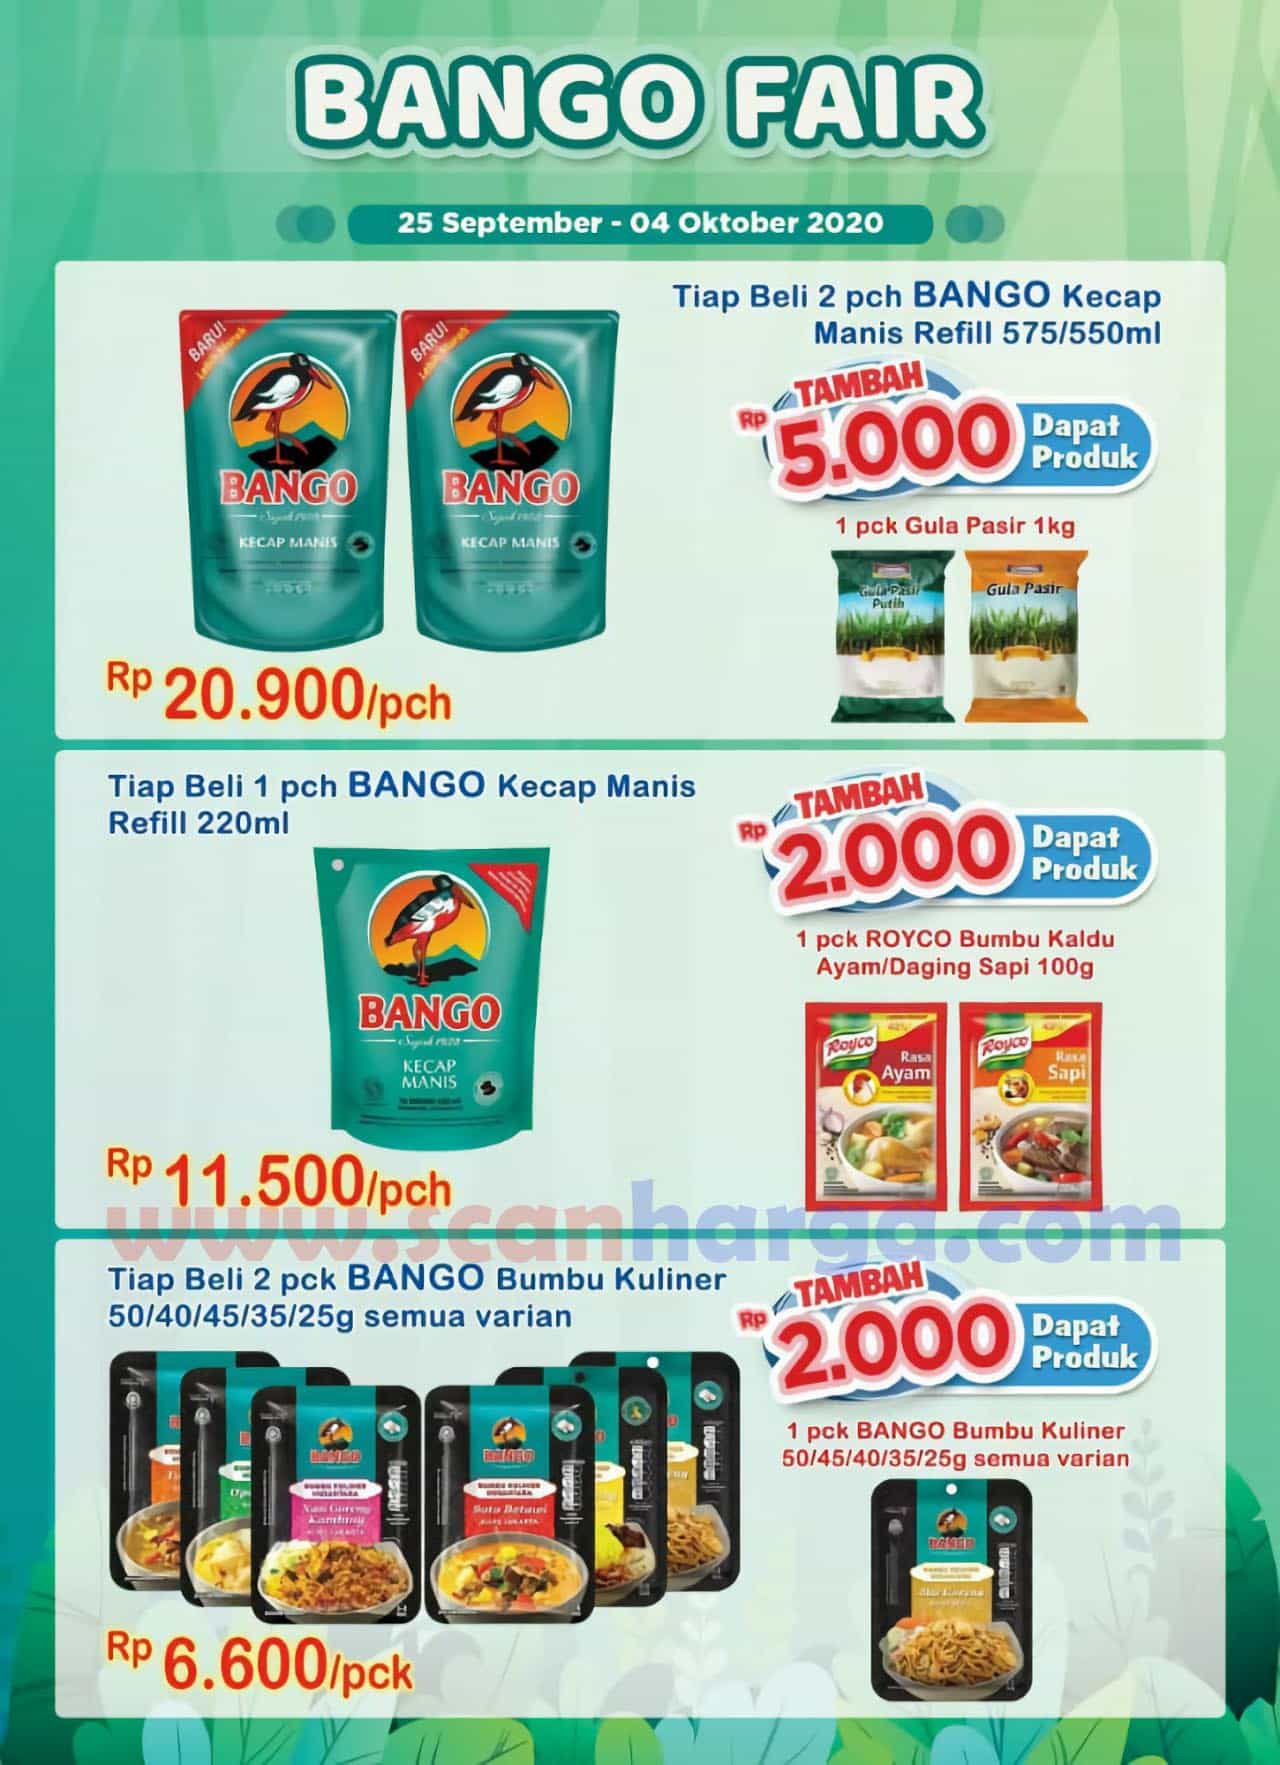 Promo Indomaret BANGO FAIR Periode 25 September - 4 Oktober 2020